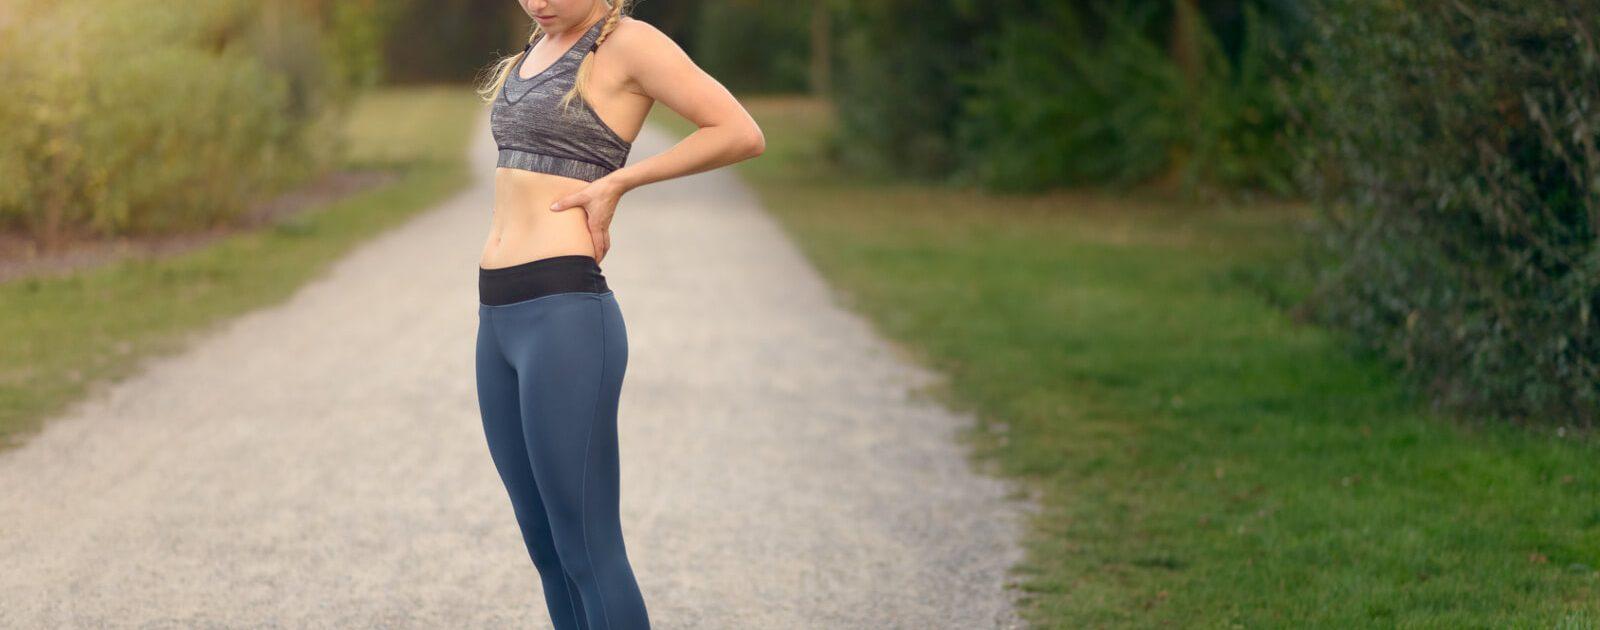 LWS-Syndrom quält junge Frau beim Joggen